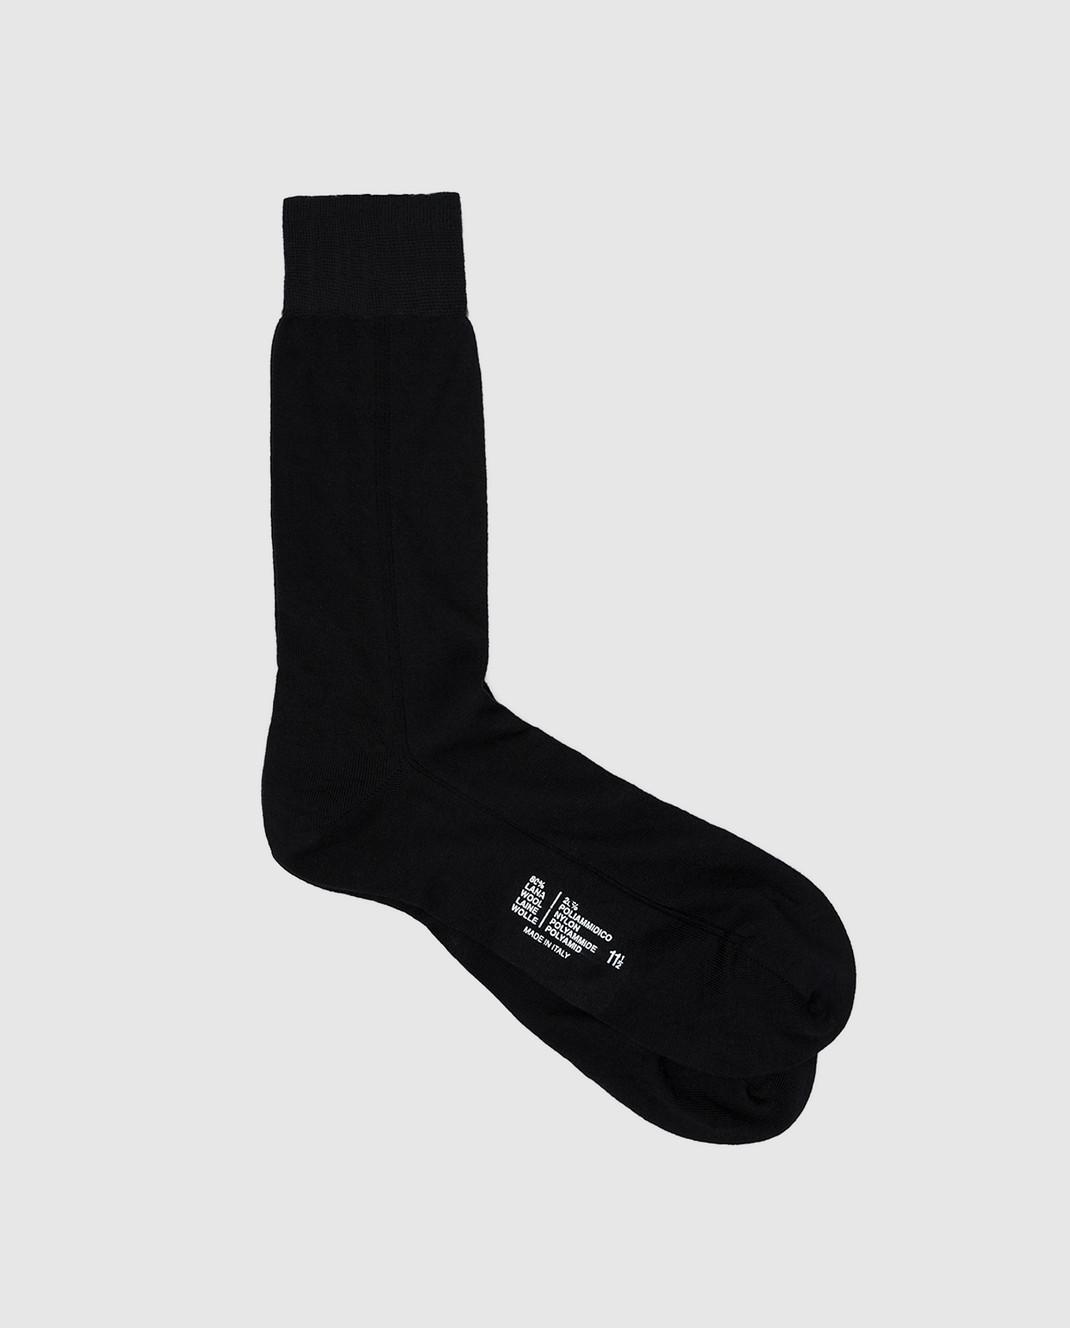 RiminiVeste Темно-синие носки из шерсти WN8011EMINENCE